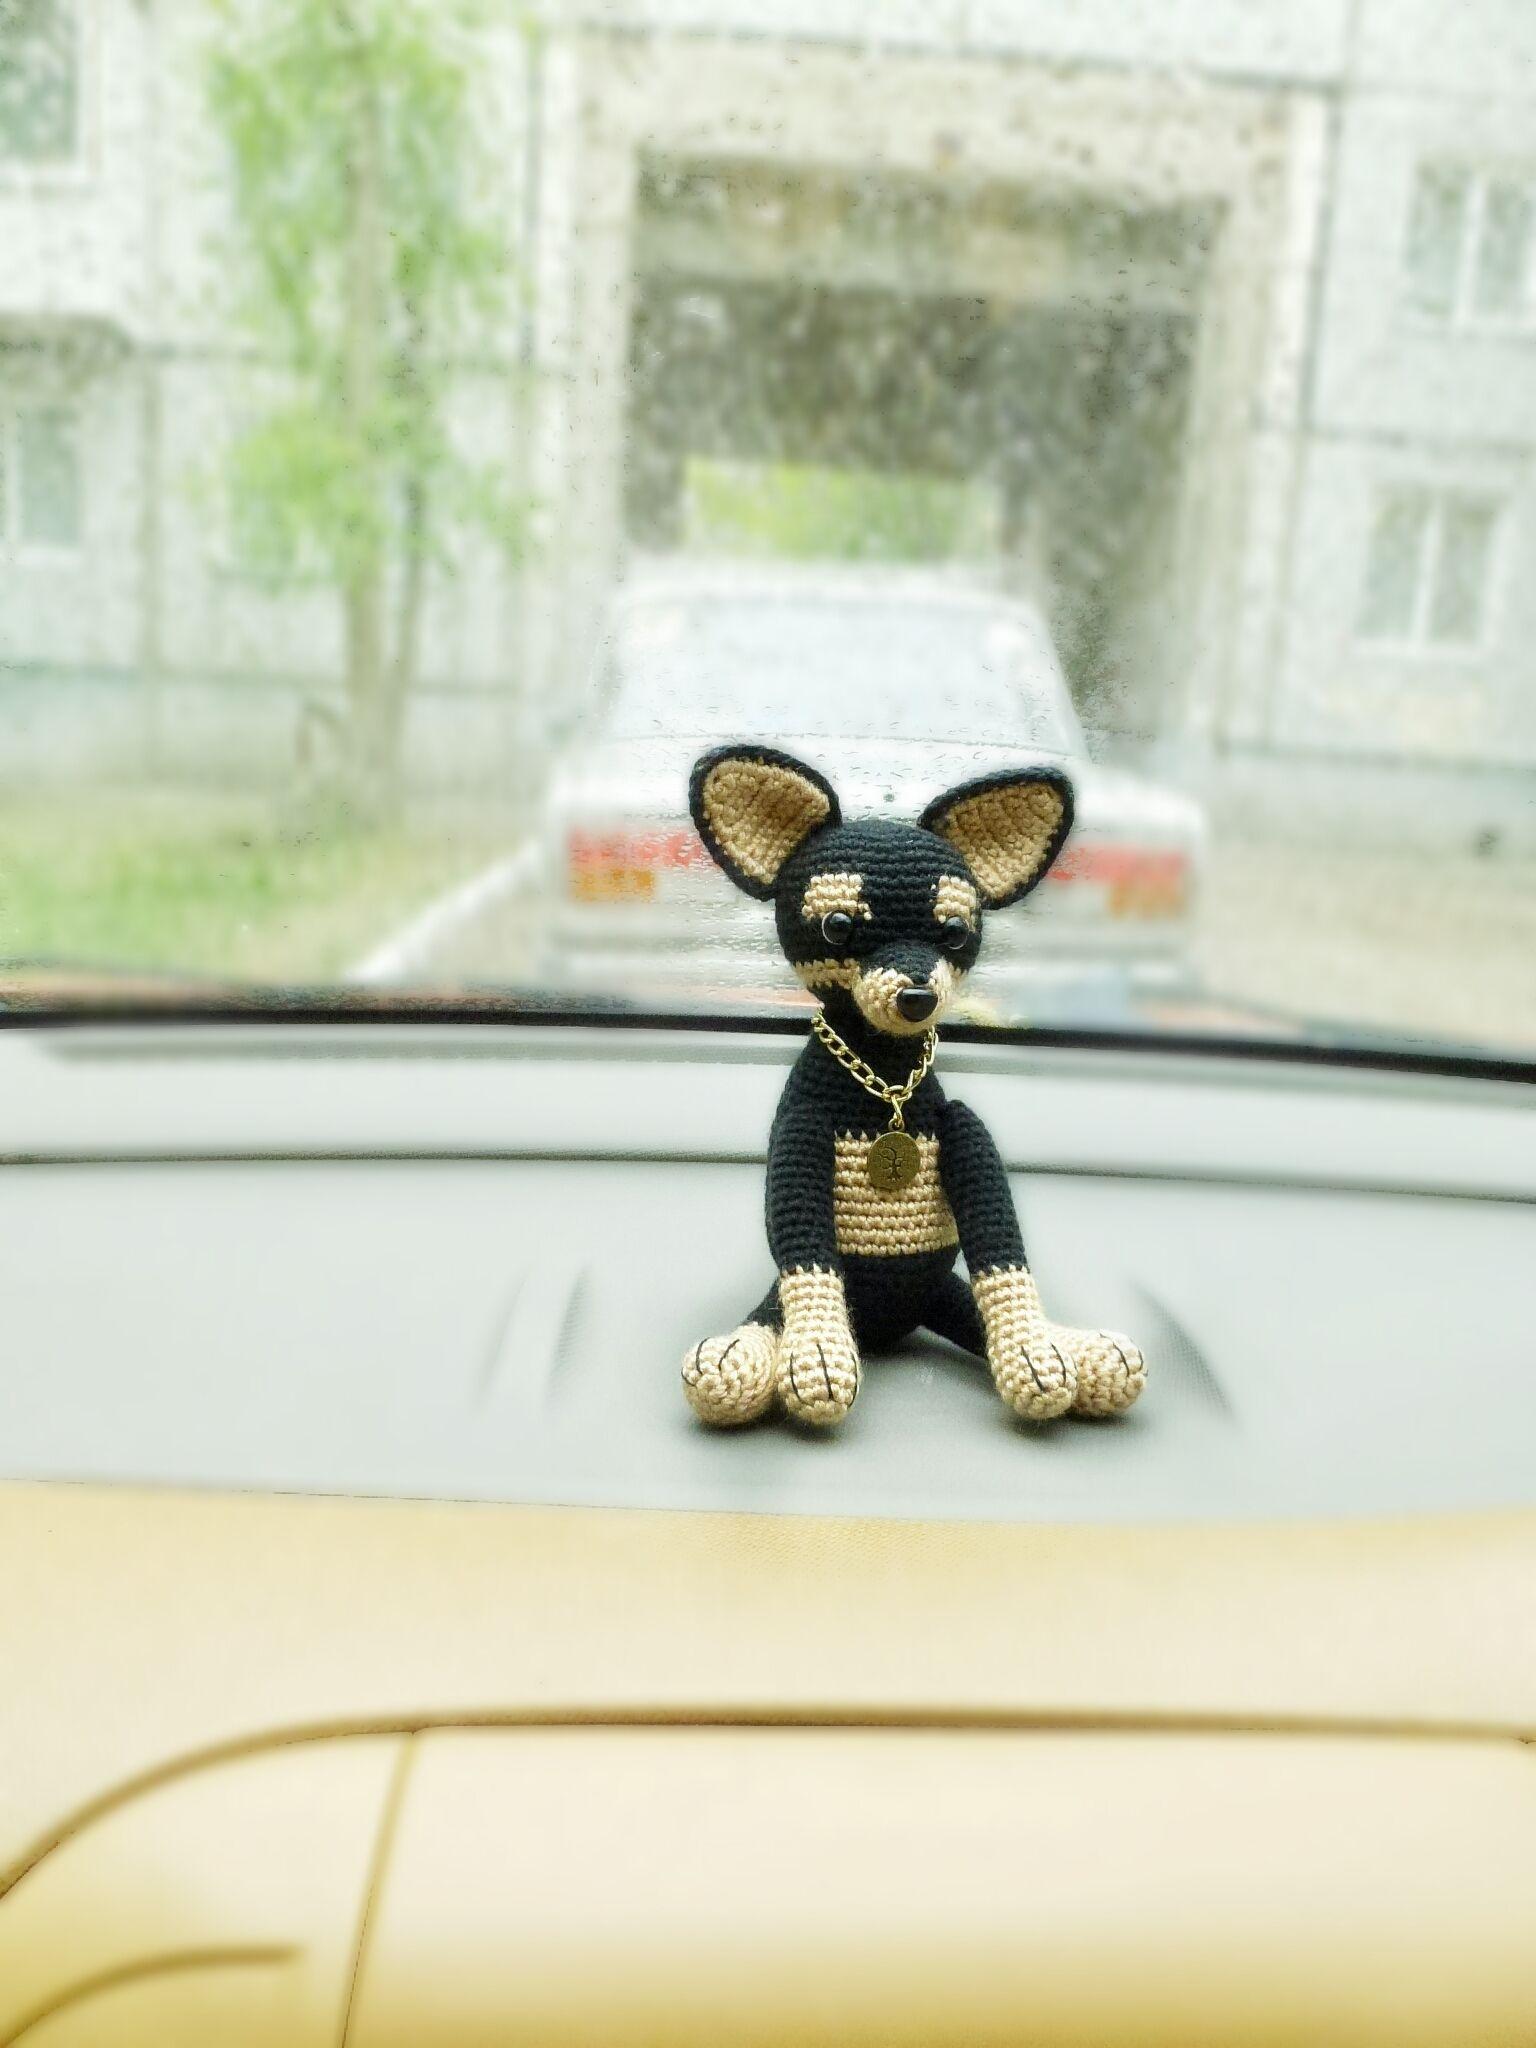 Mini Dogs Toy In The Car Cute Car Accessories Car Crochet Dogs